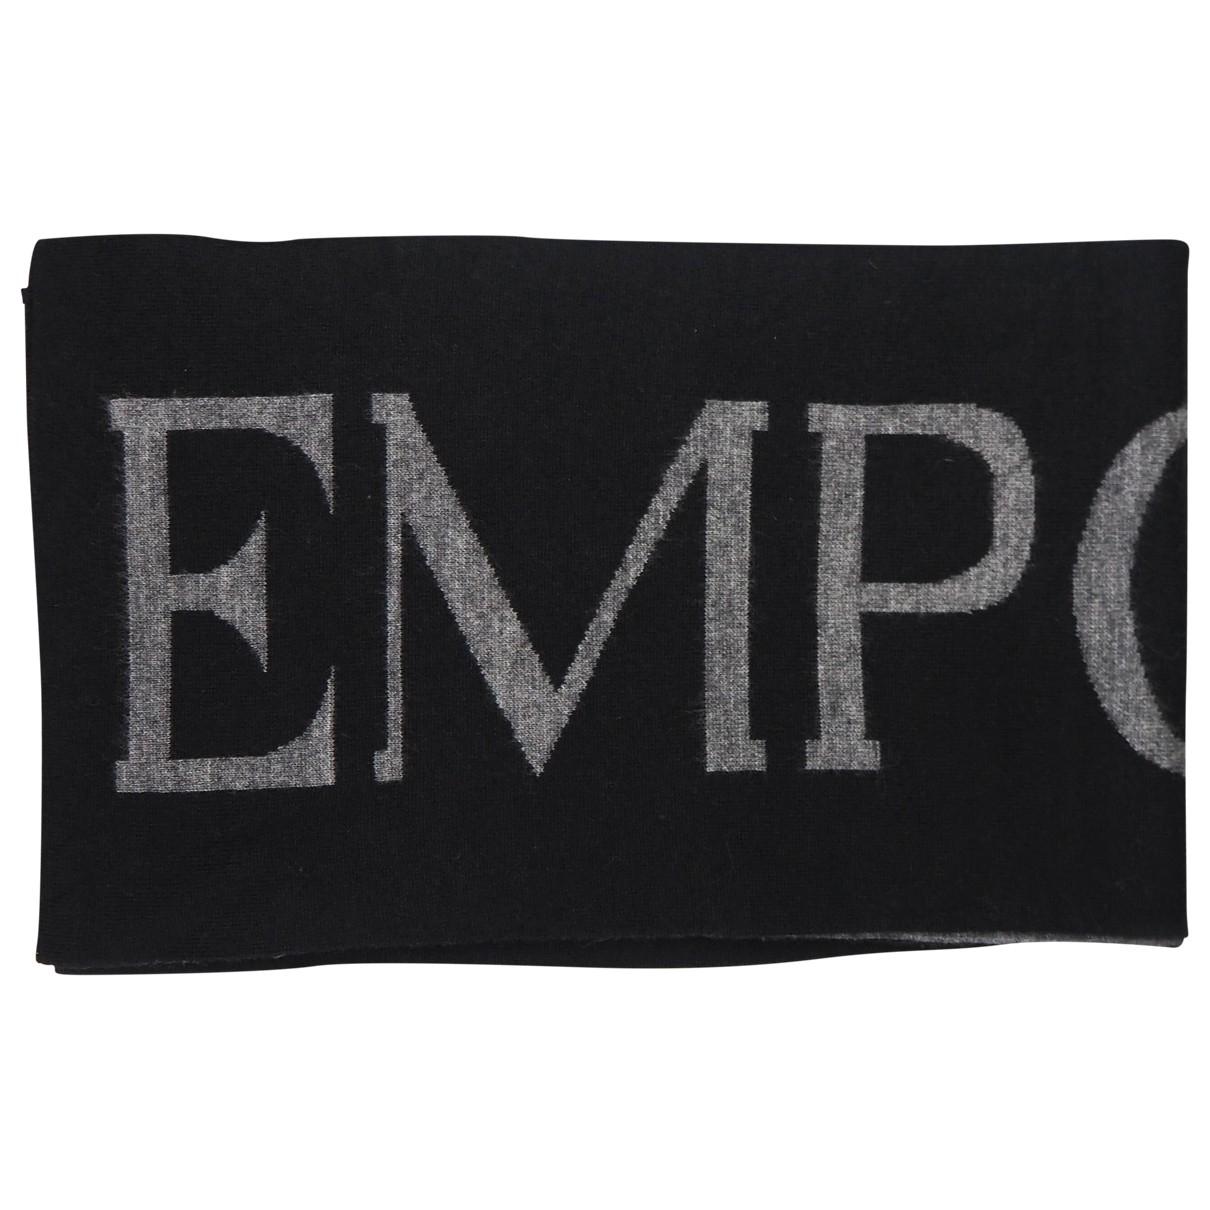 Emporio Armani - Cheches.Echarpes   pour homme en laine - anthracite